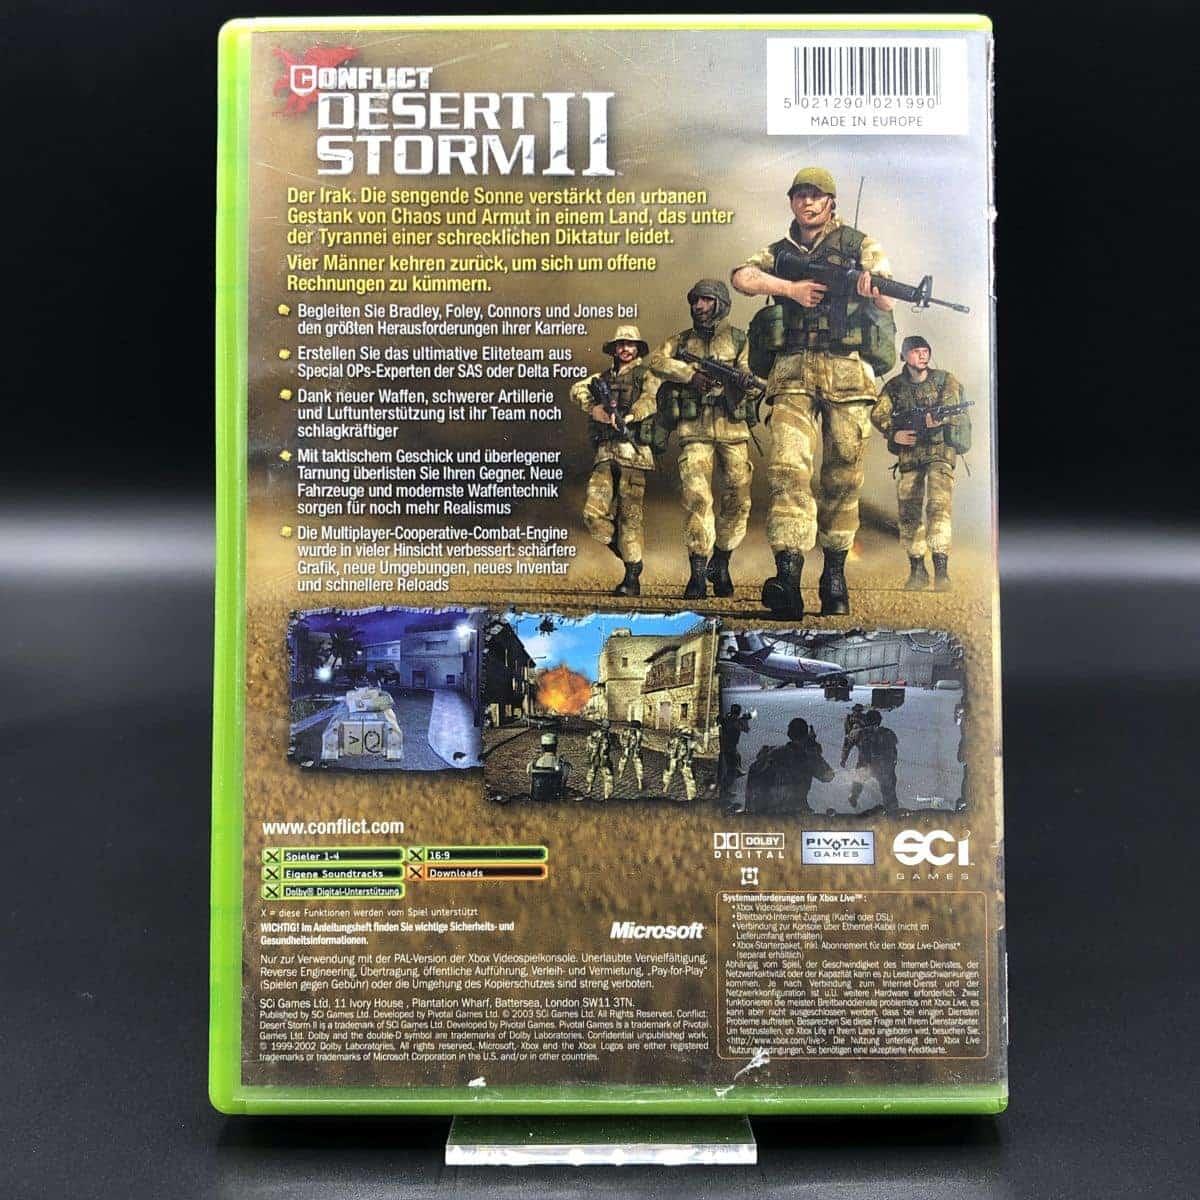 XBC Conflict: Desert Storm II (Komplett) (Gebrauchsspuren) Microsoft Xbox Classic